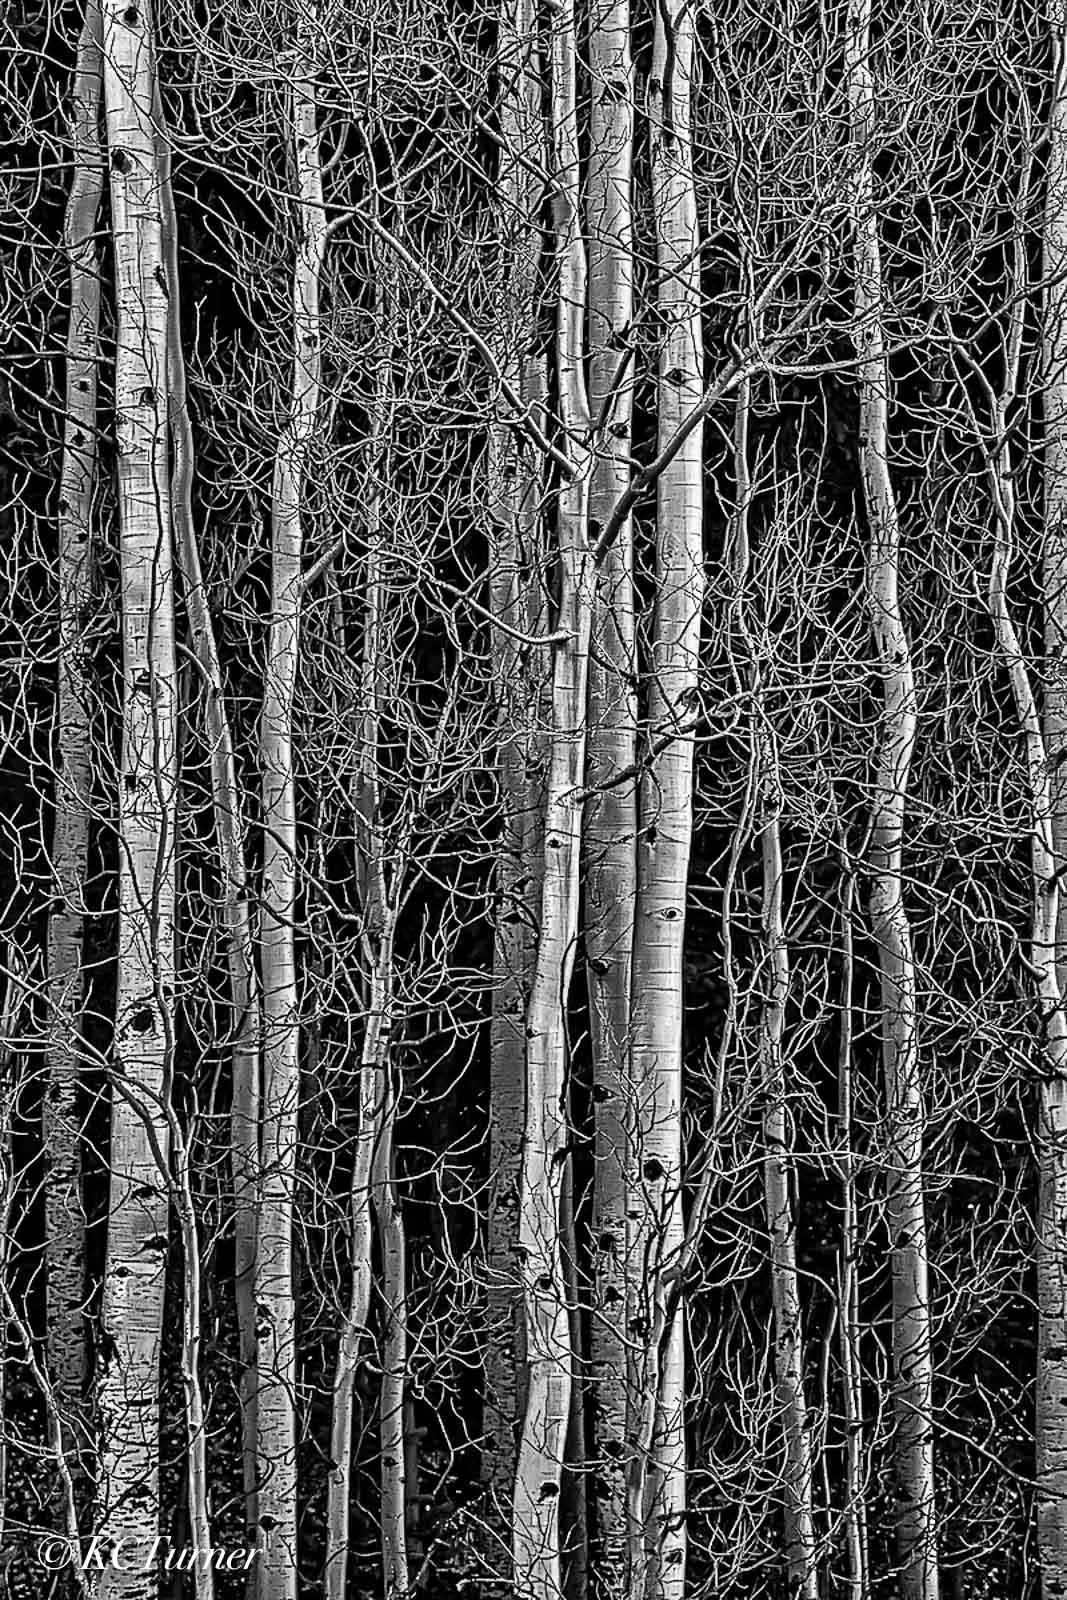 Colorado, monochrome, black and white, photograqph, silver, aspen trees, photo